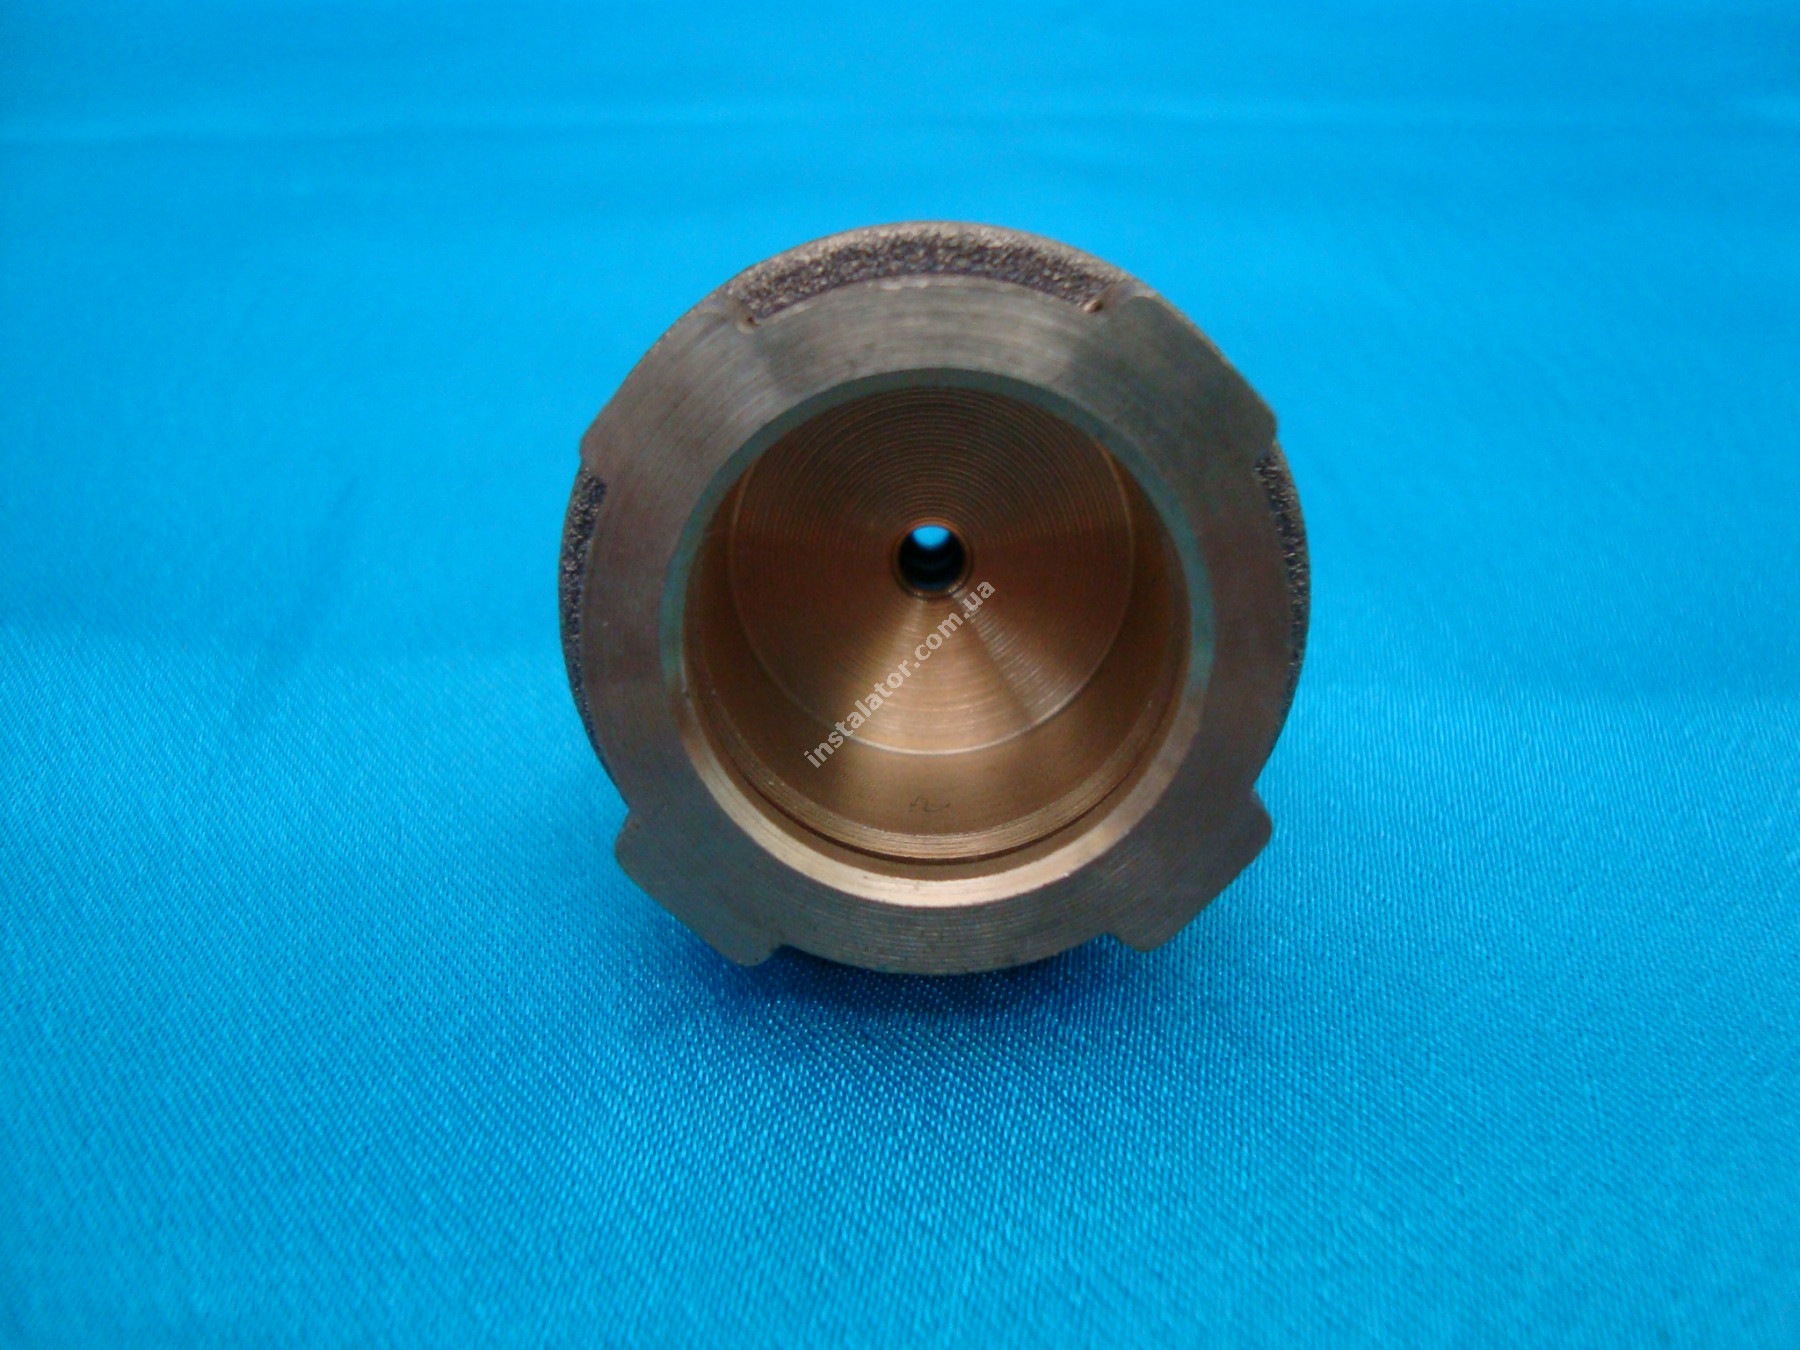 600750 Втулка 3-х ходового клапана FUGAS full-image-1